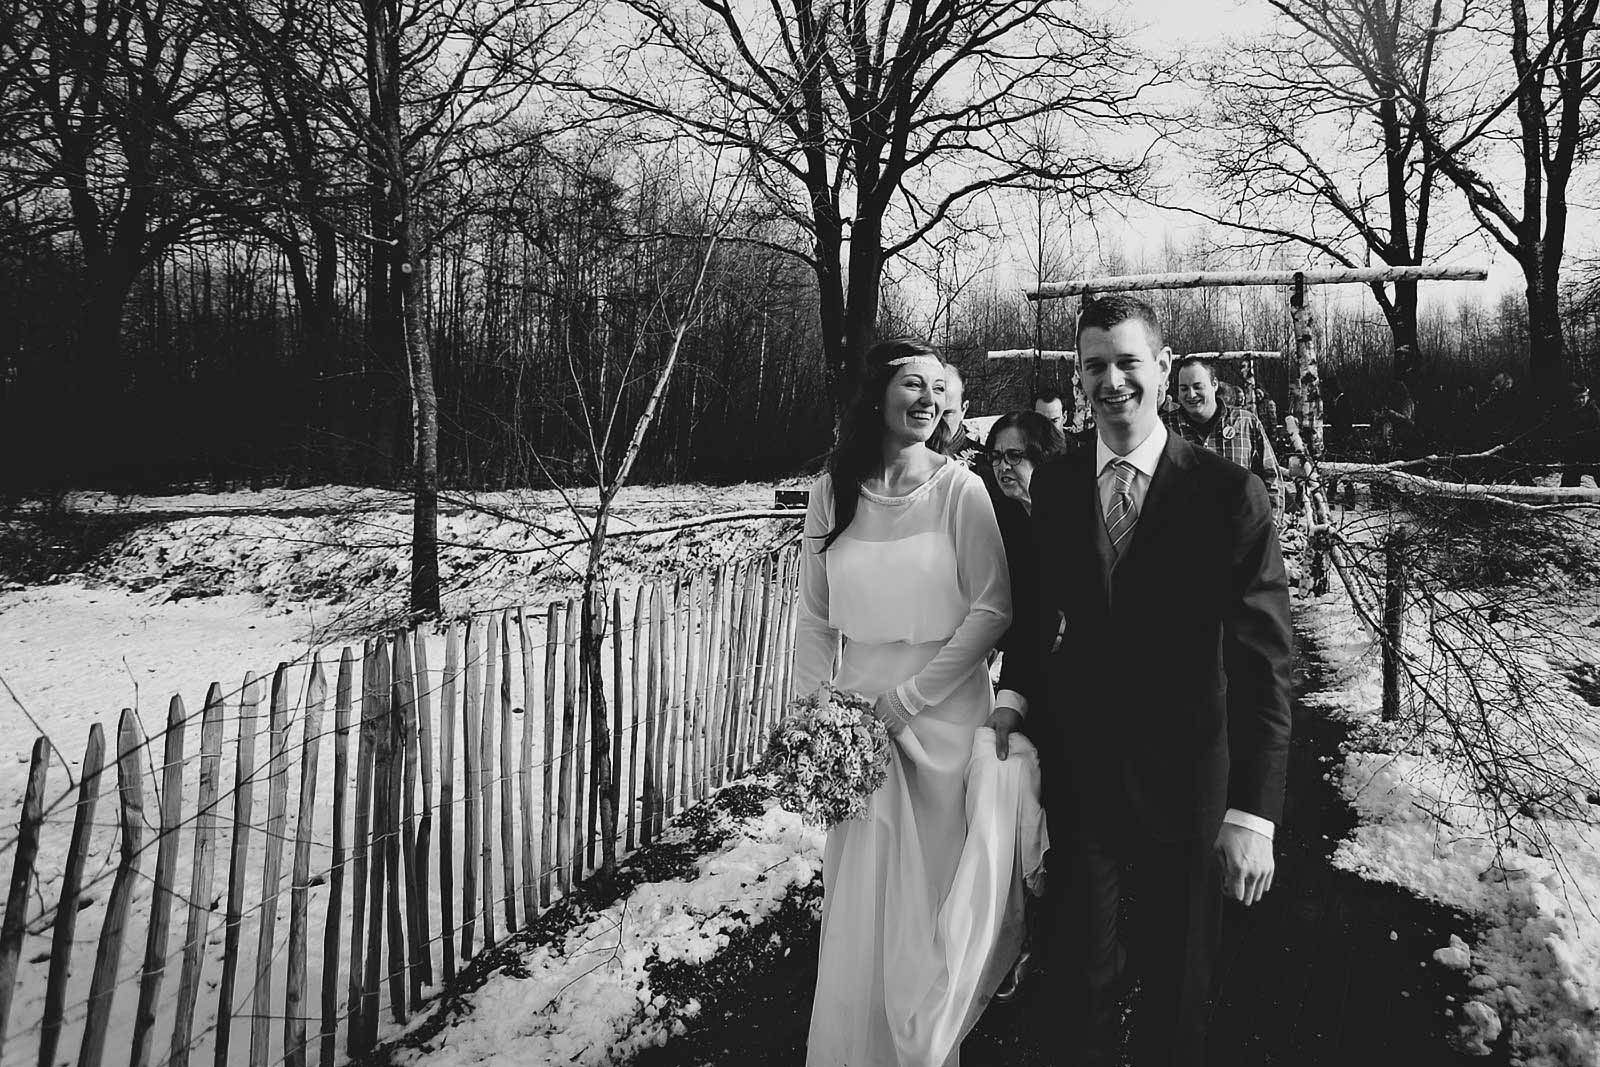 Evabloemweddings_bruidsfotografie_winterbruiloft_084.jpg